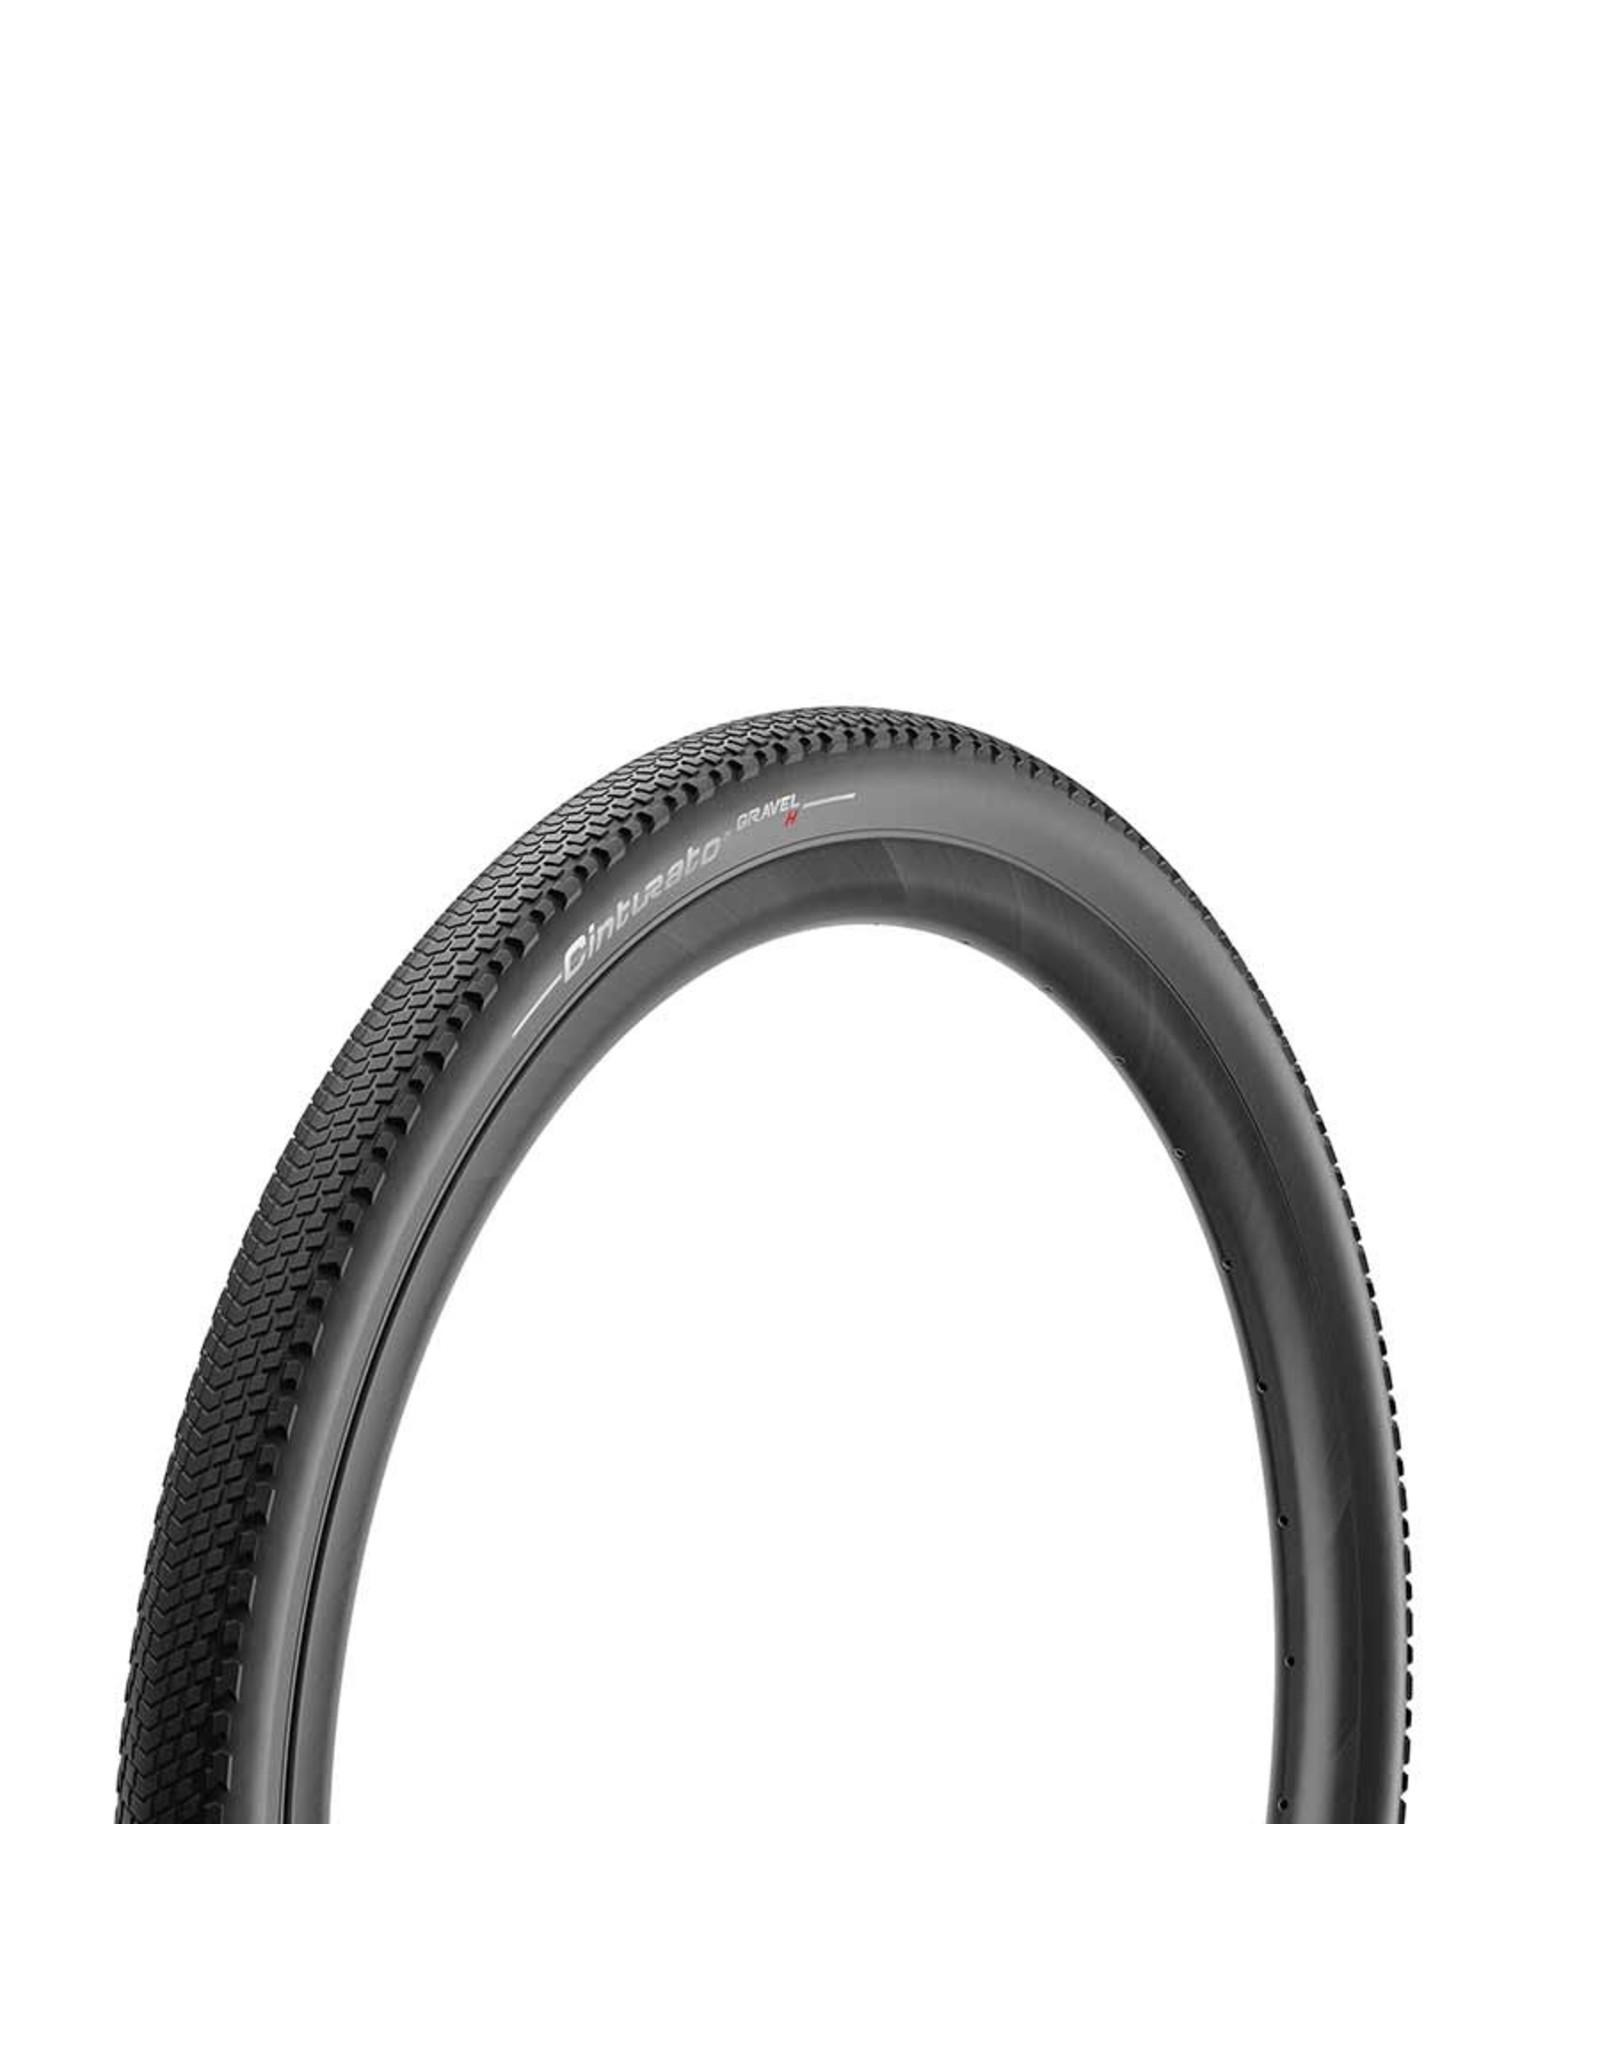 Pirelli, Cinturato Gravel H, Tire, 650Bx45, Folding, Tubeless Ready, SpeedGrip, 127TPI, Black